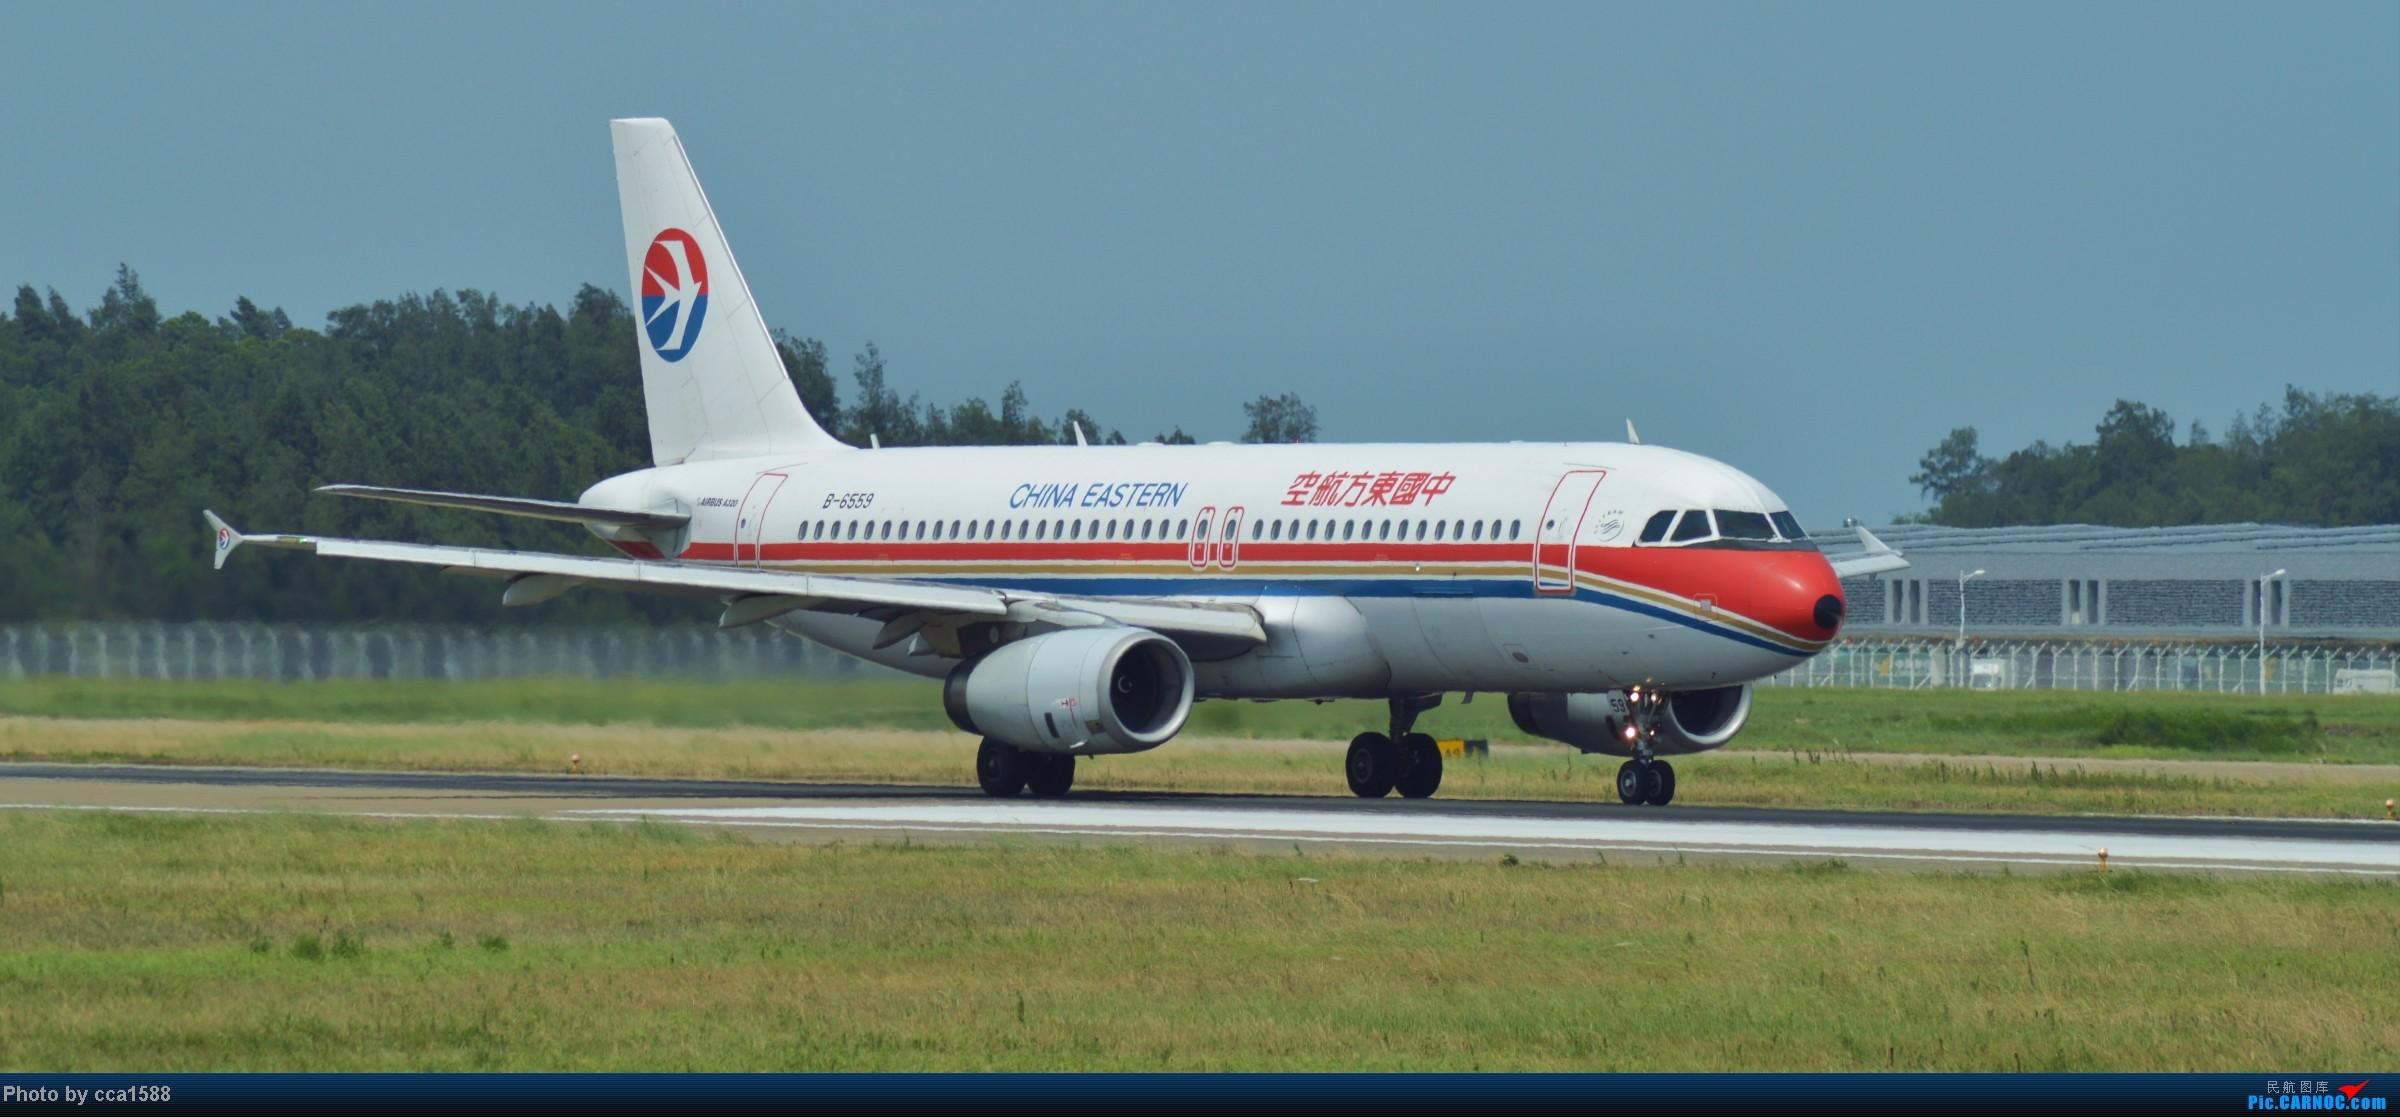 Re:[原创]7.25--FOC拍机集锦~(复兴、新舟60、还有更多惊喜~!) AIRBUS A320-200 B-6559 中国福州长乐机场